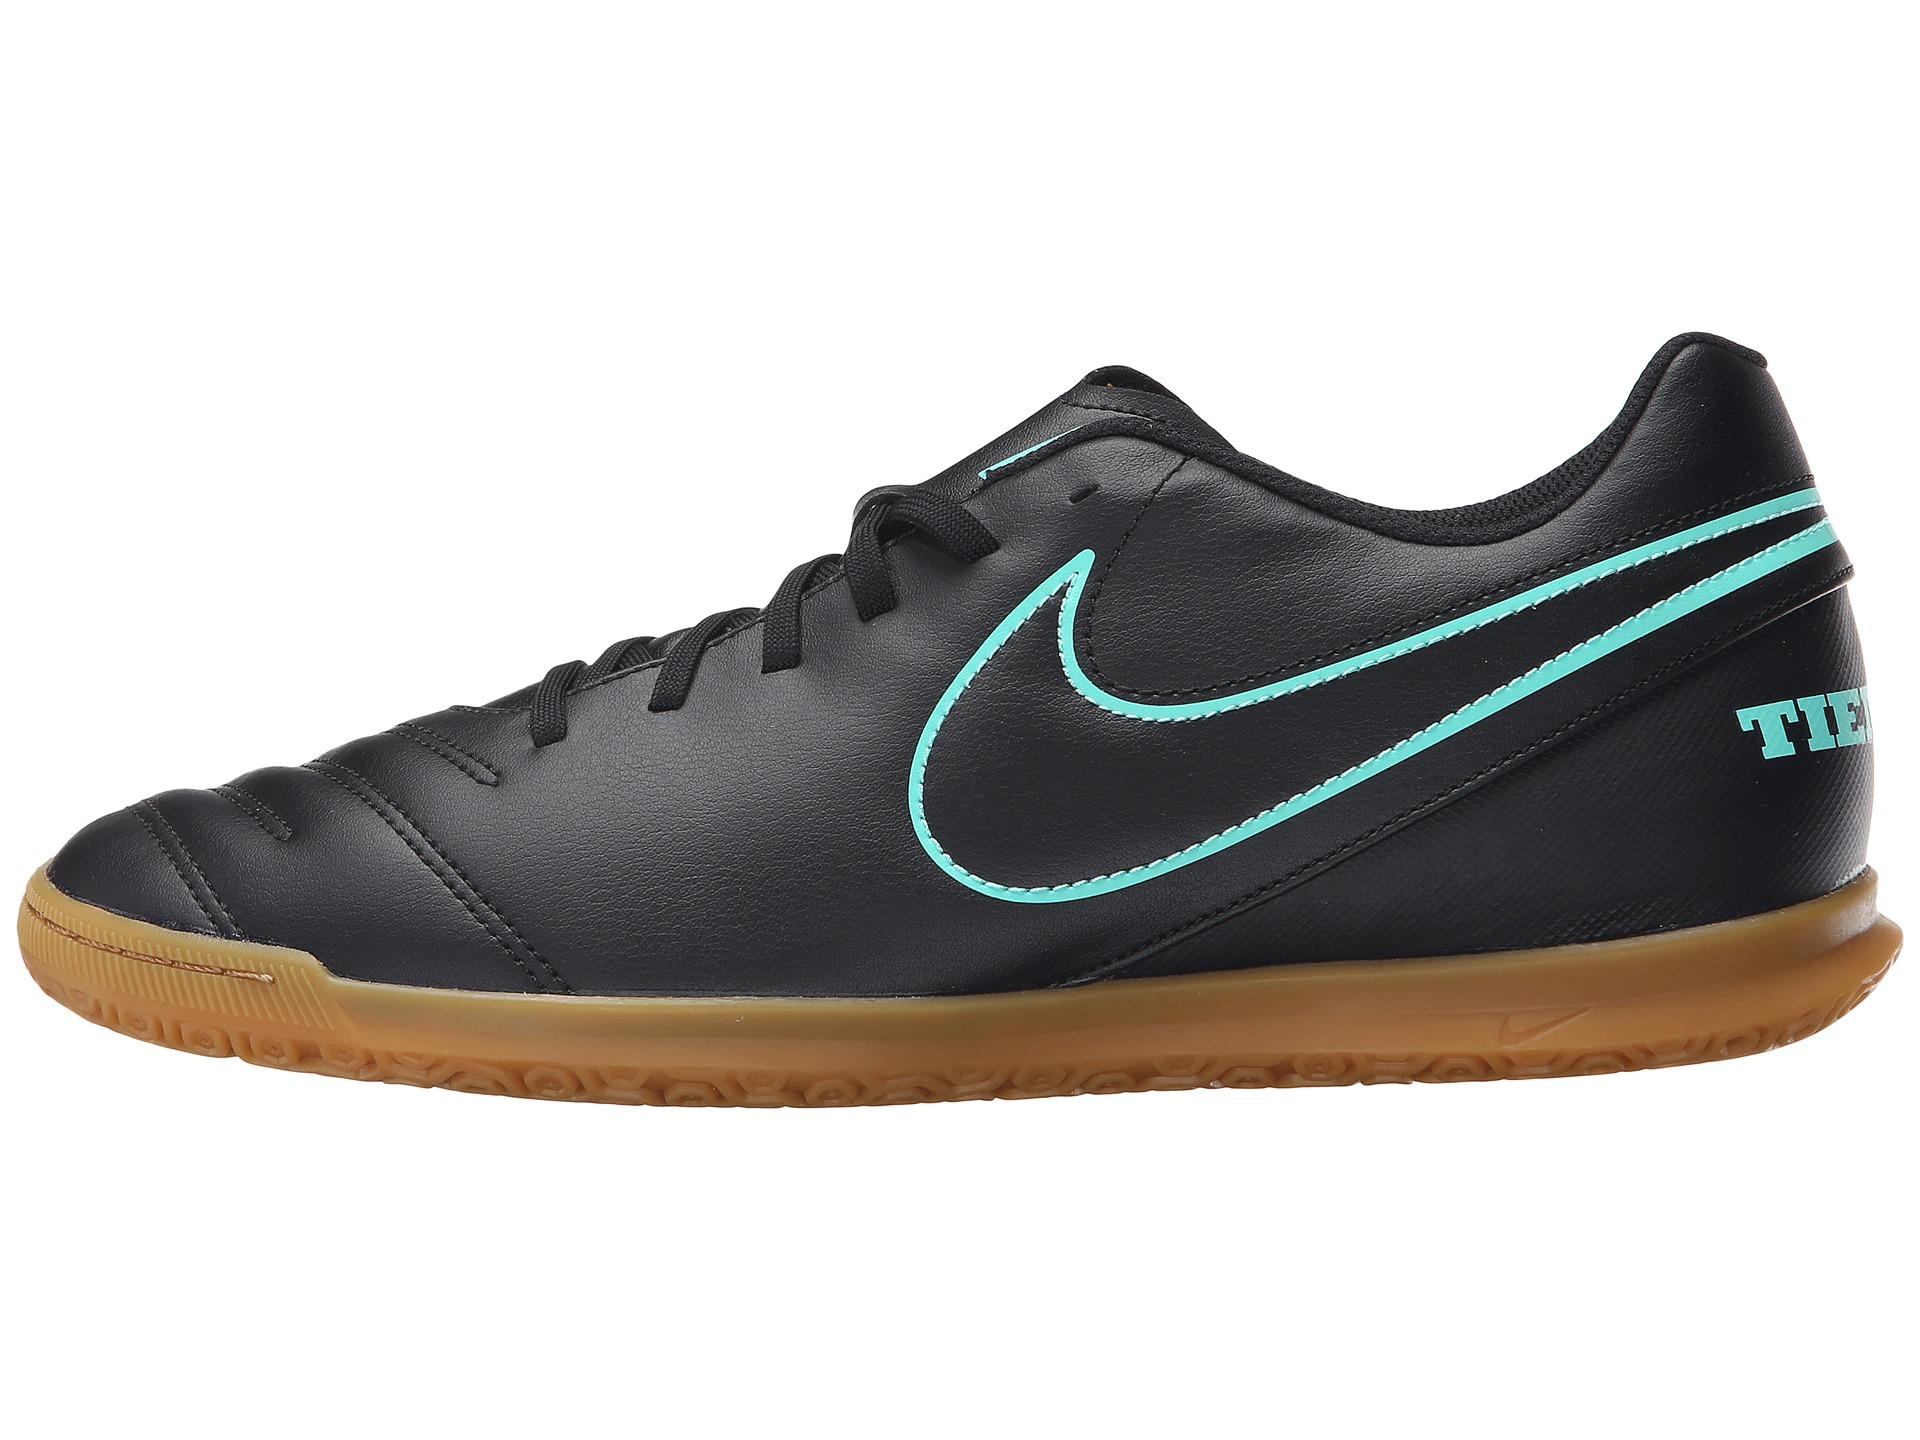 Nike Tiempo Legend Elite Iv Fg Firm Ground Soccer Shoes